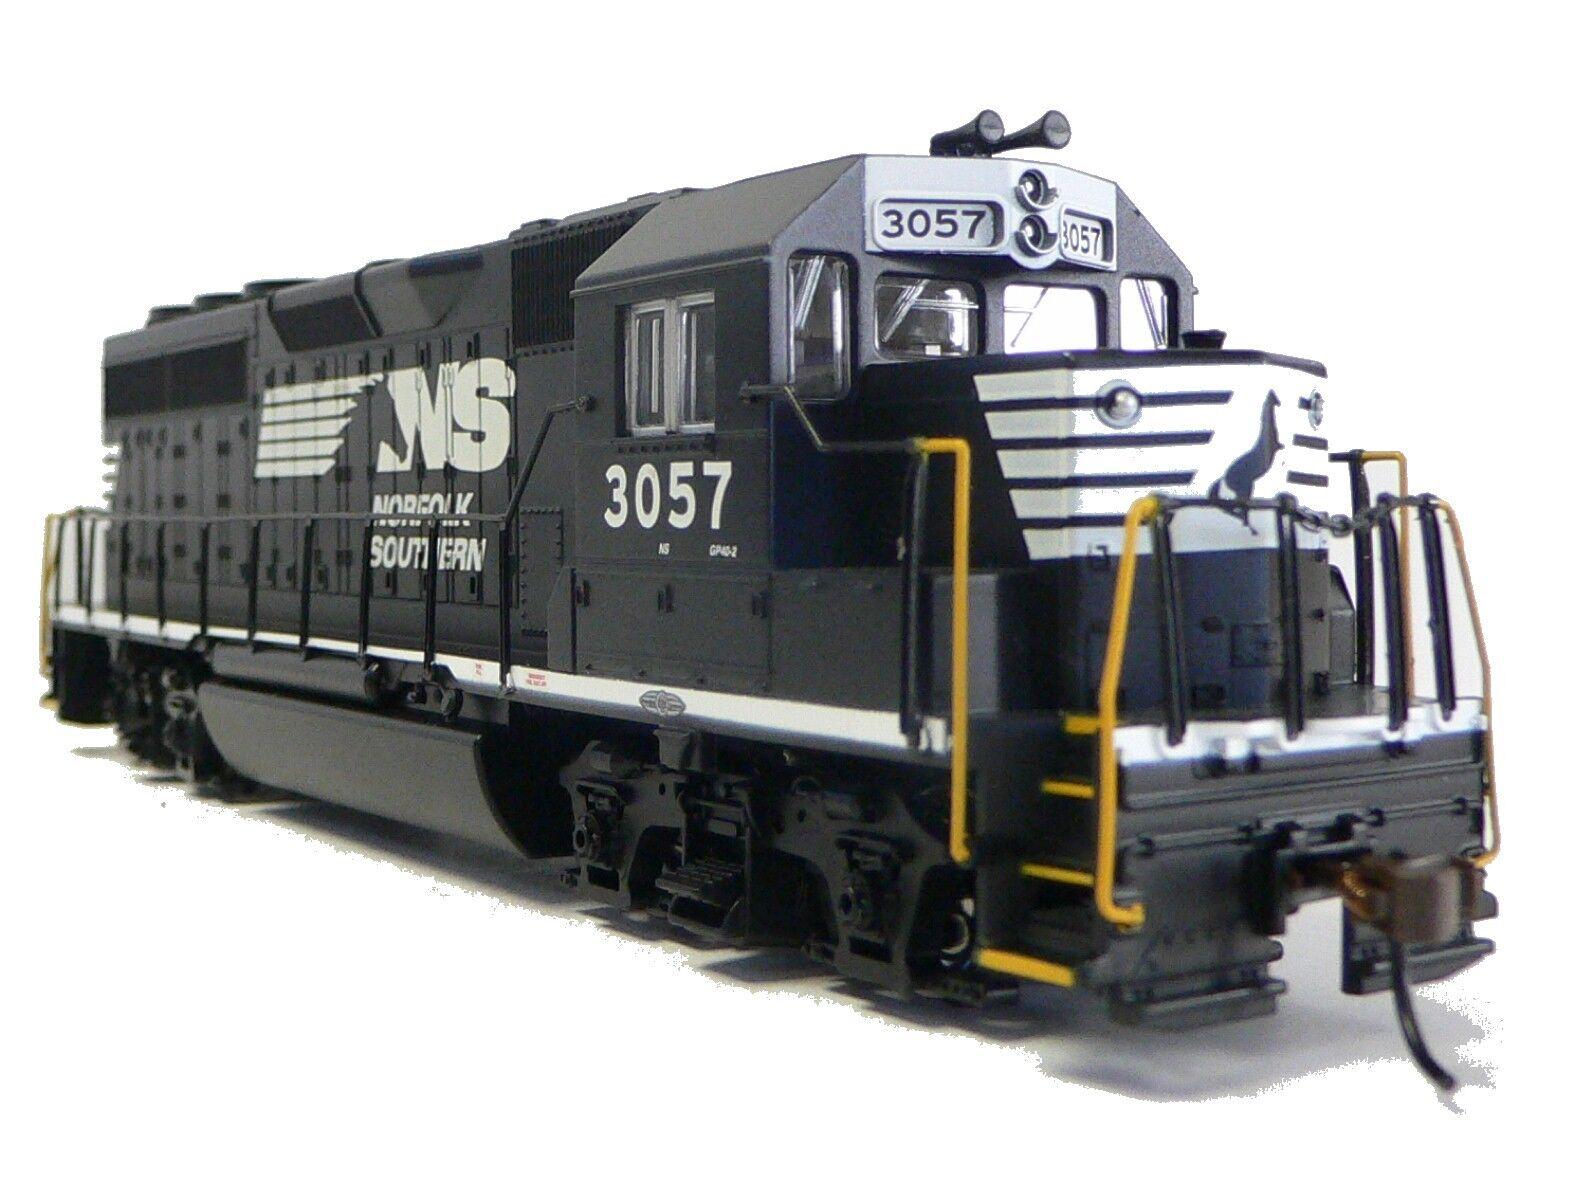 HO Scale Model Railroad Train Engine Norfolk Southern GP-40 GP-40 GP-40 Locomotive DCC Sound ec1c16